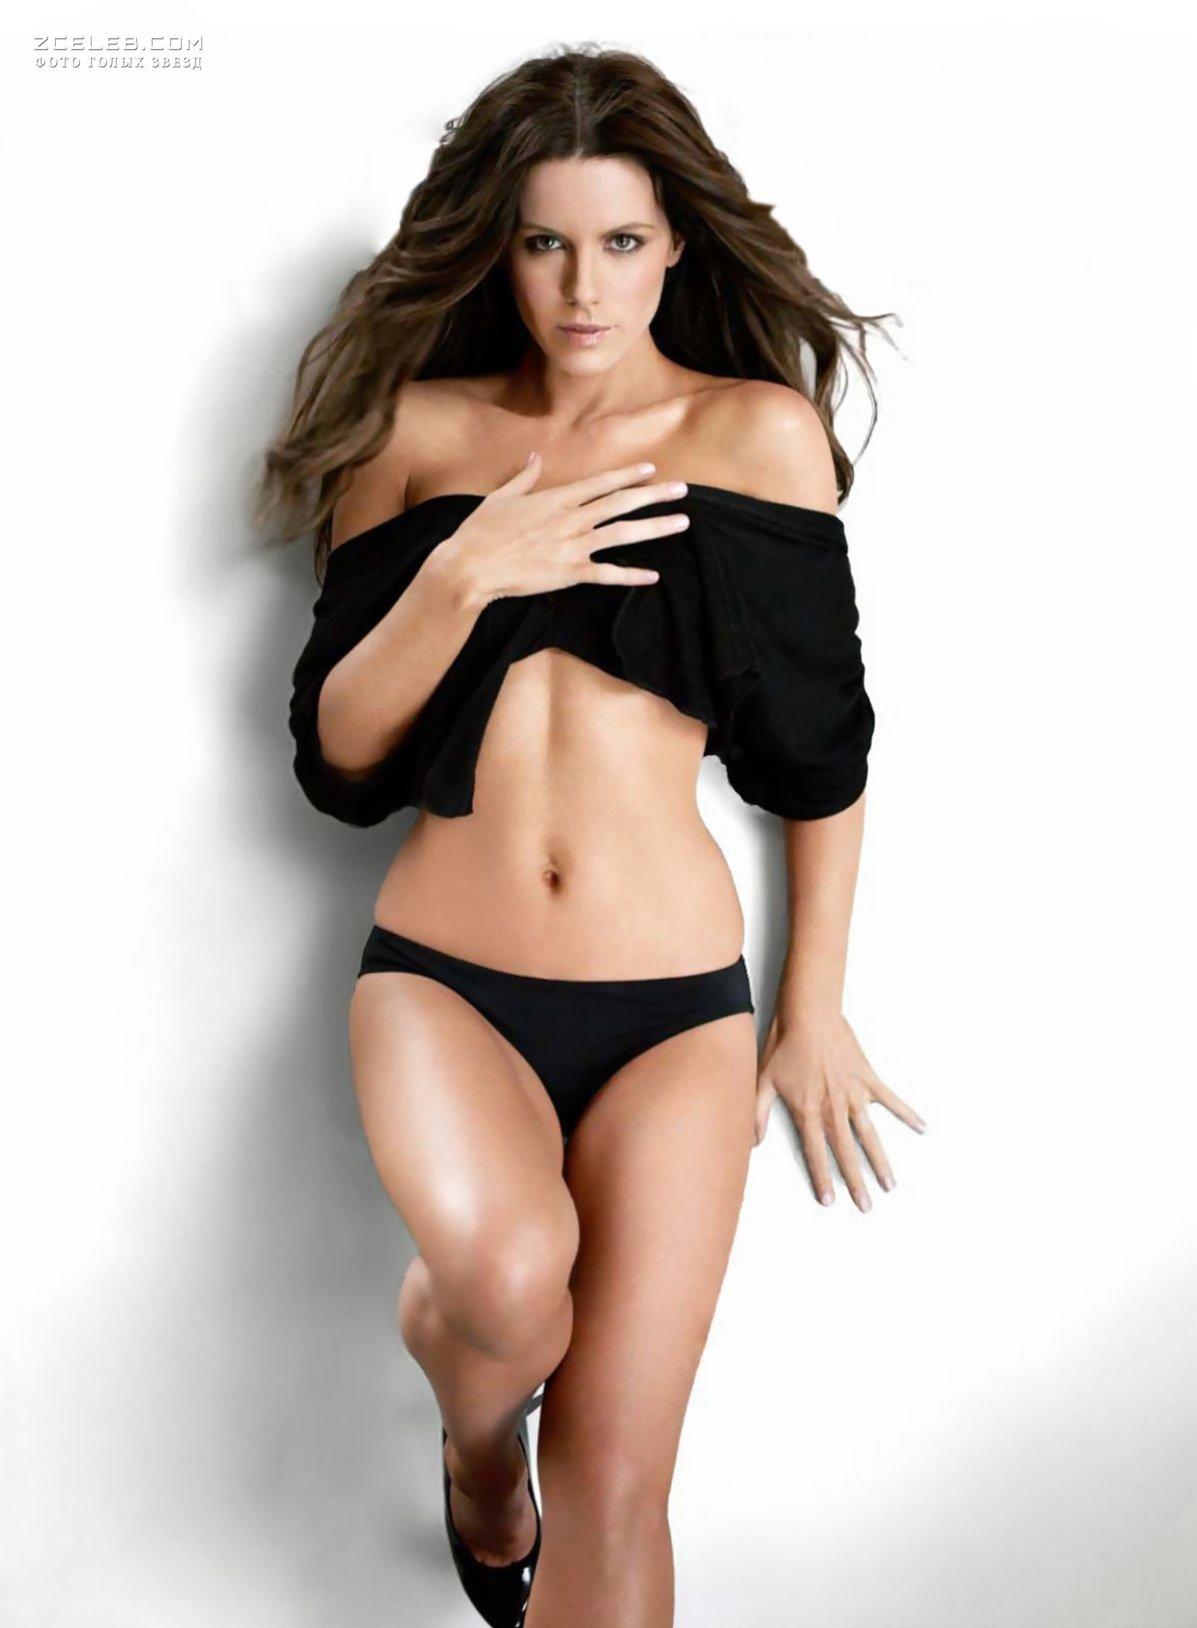 Kate beckinsale nude images